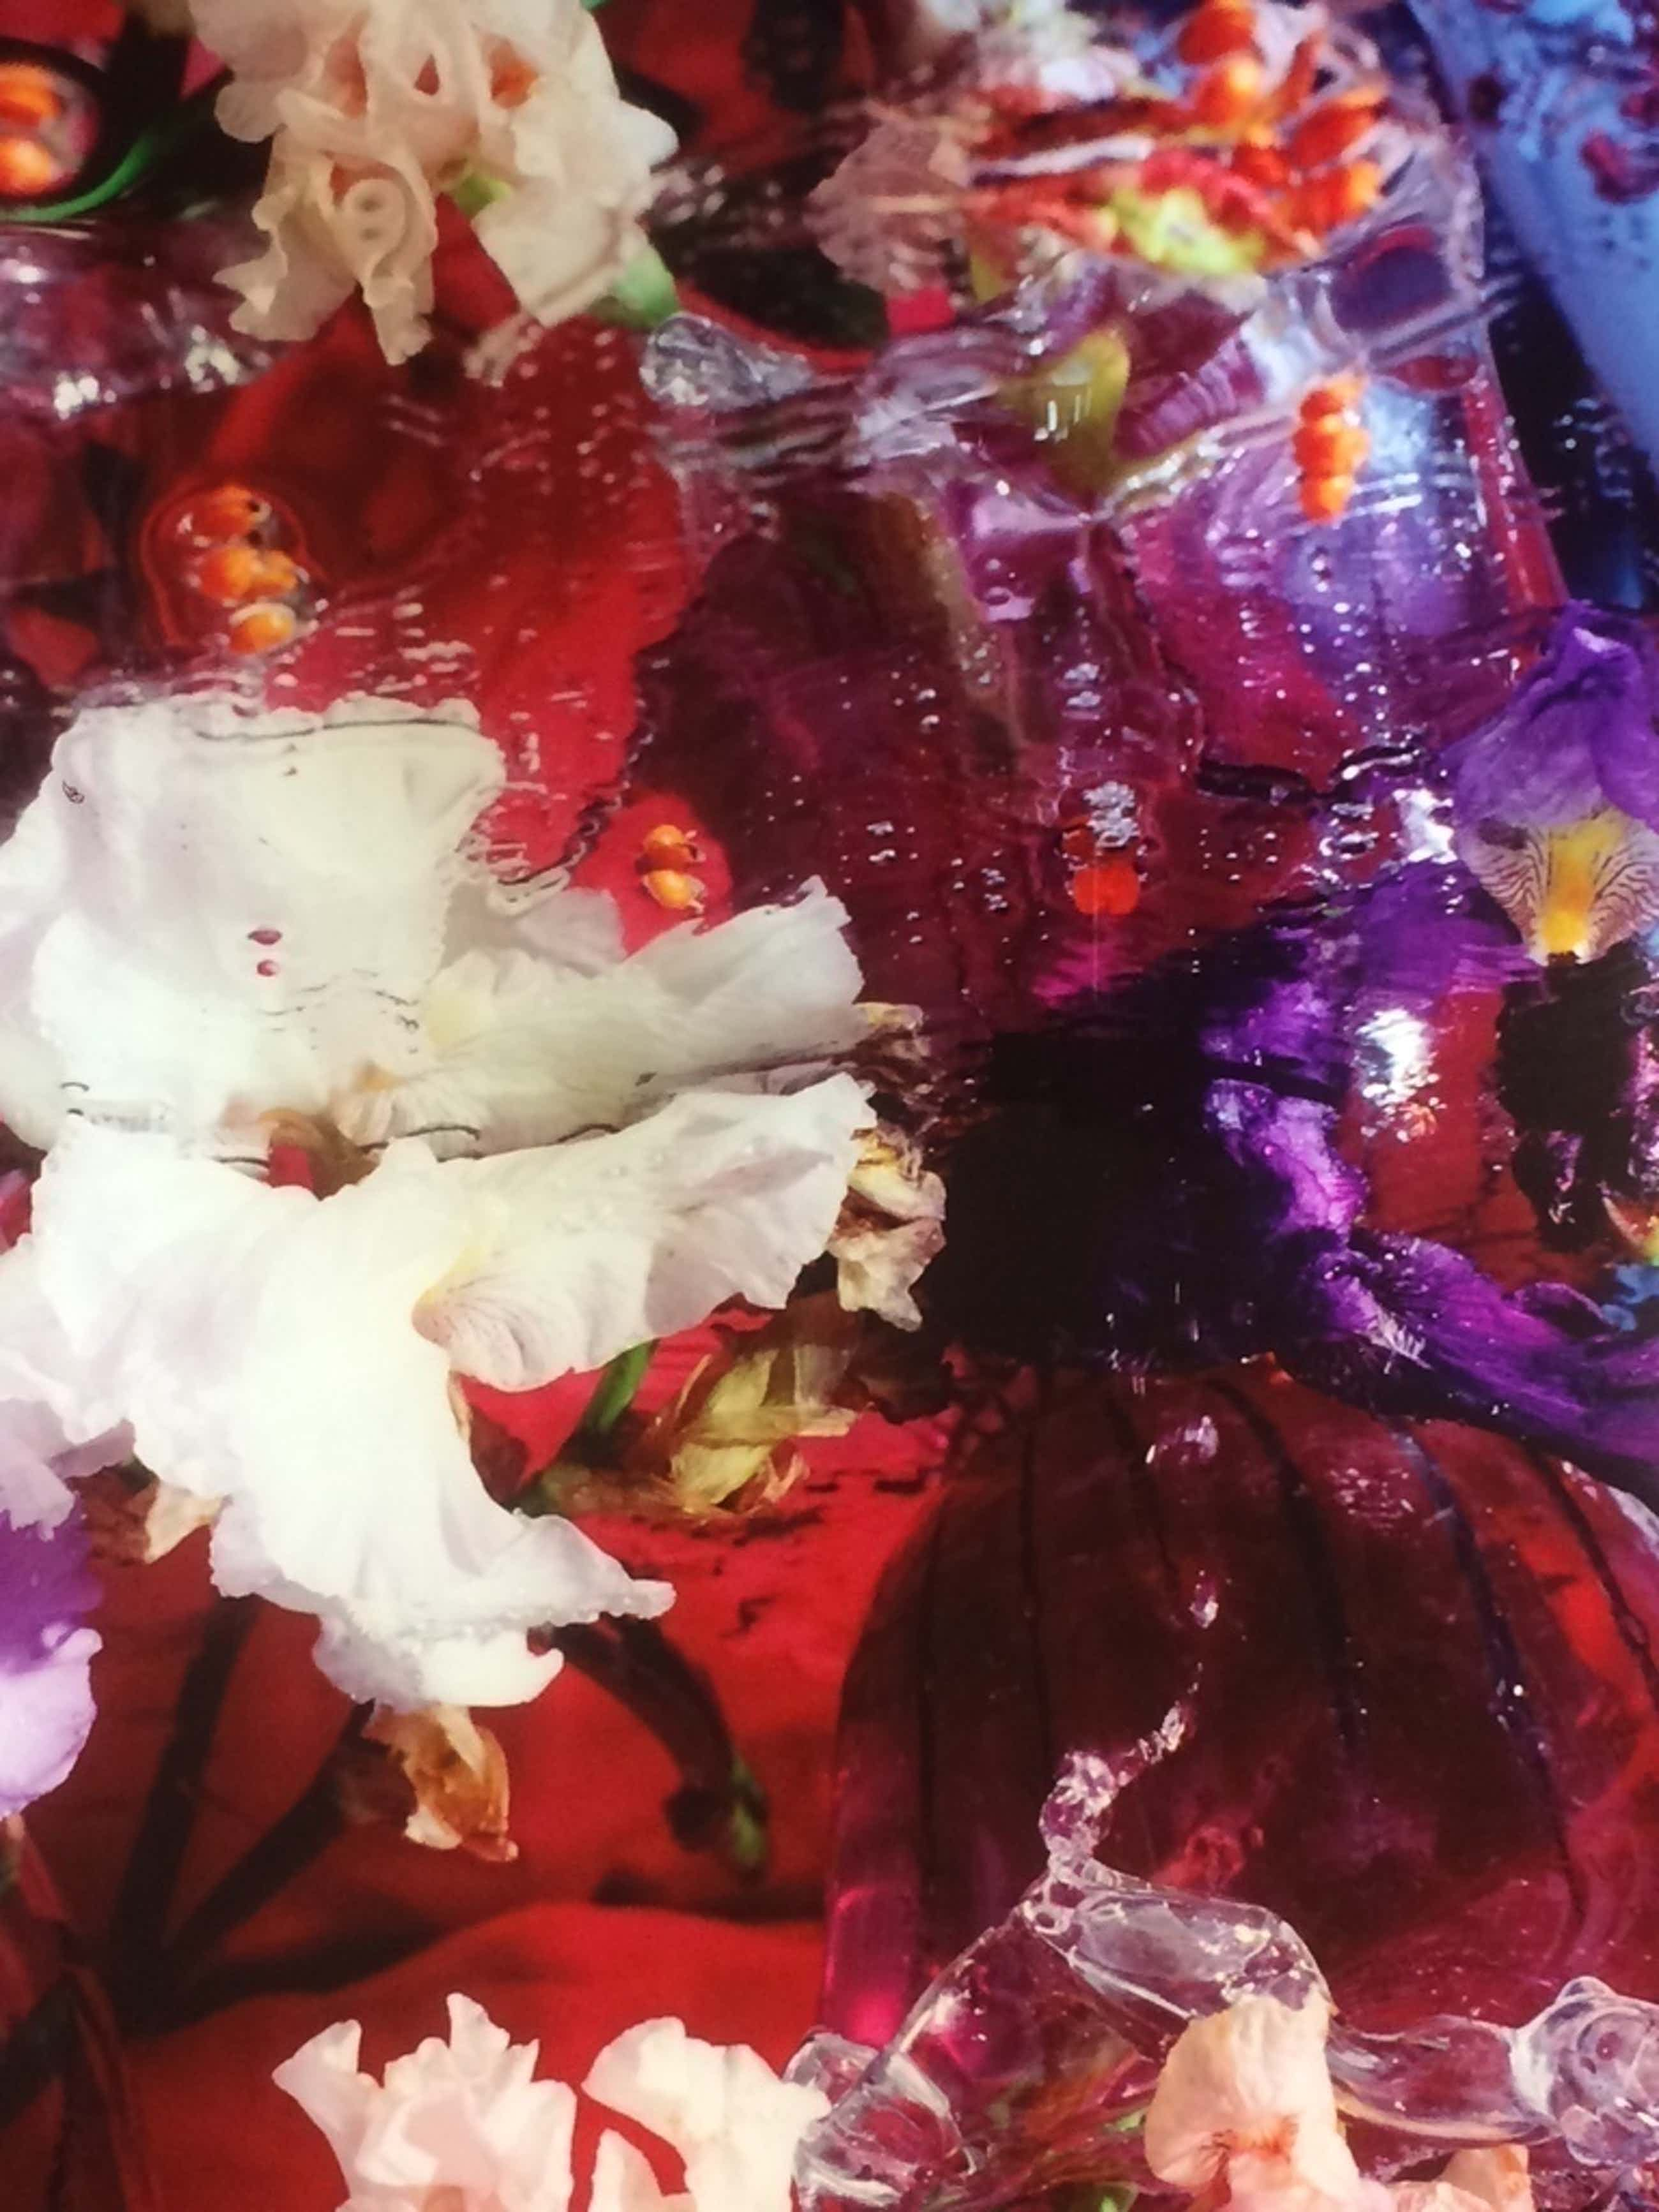 Margriet Smulders, flowers, foto/cibrachrome uit 2003 in perfecte staat. 13/25 kopen? Bied vanaf 1100!